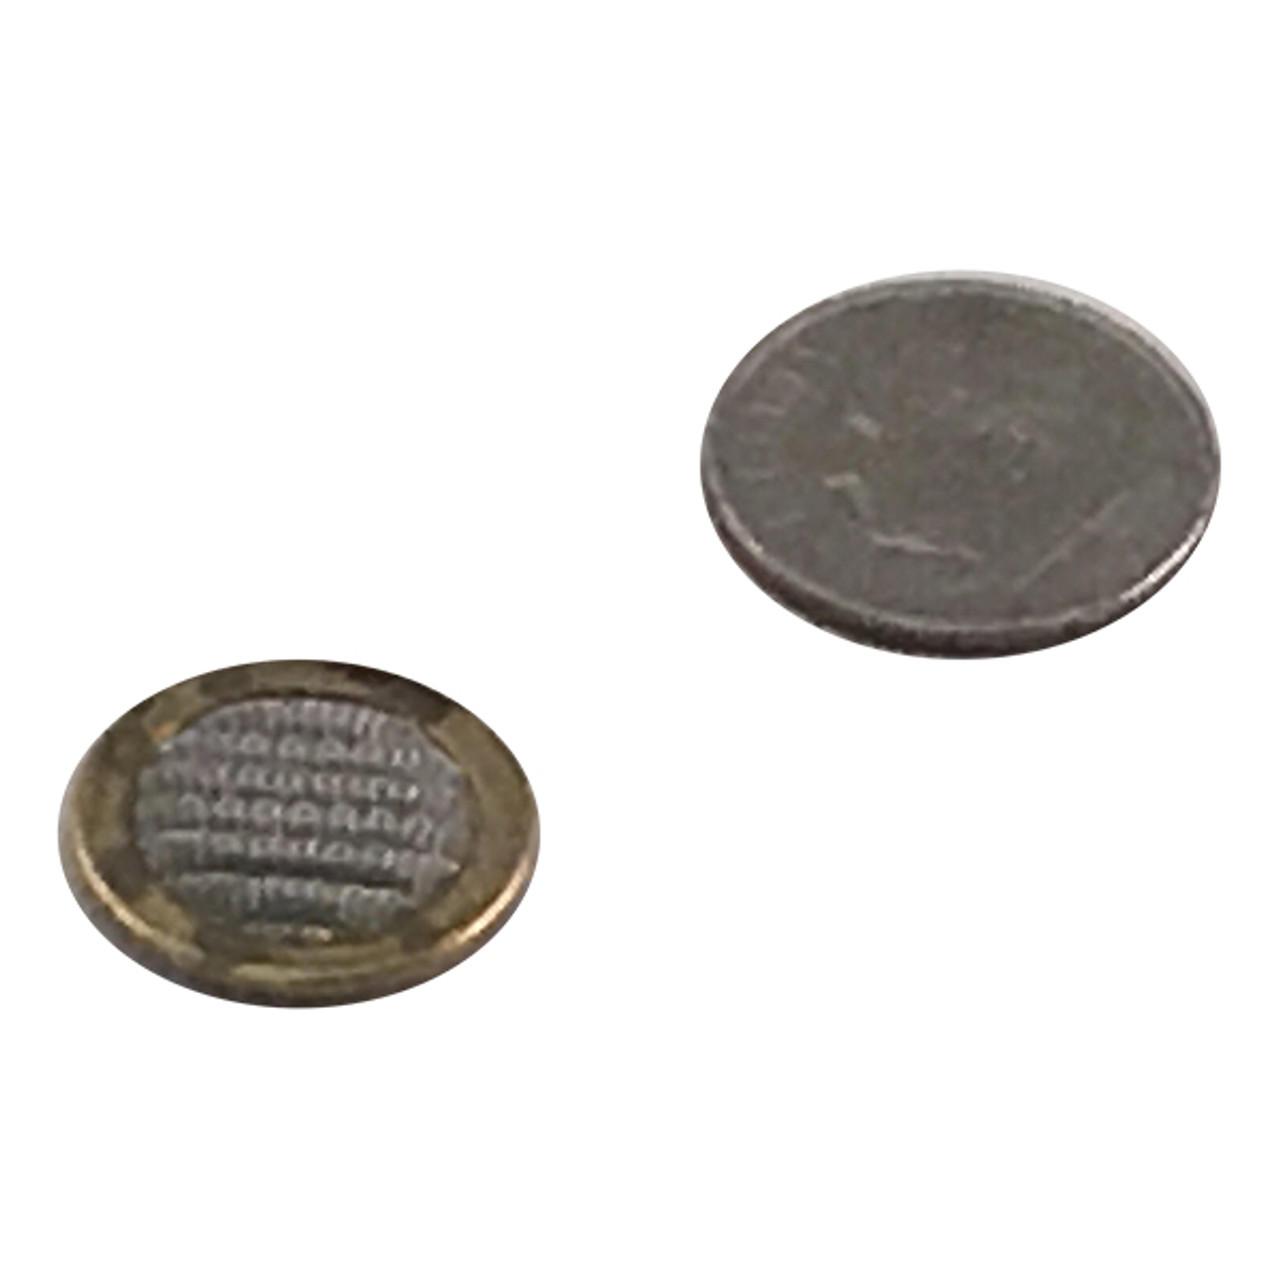 Filter Disc (425292)